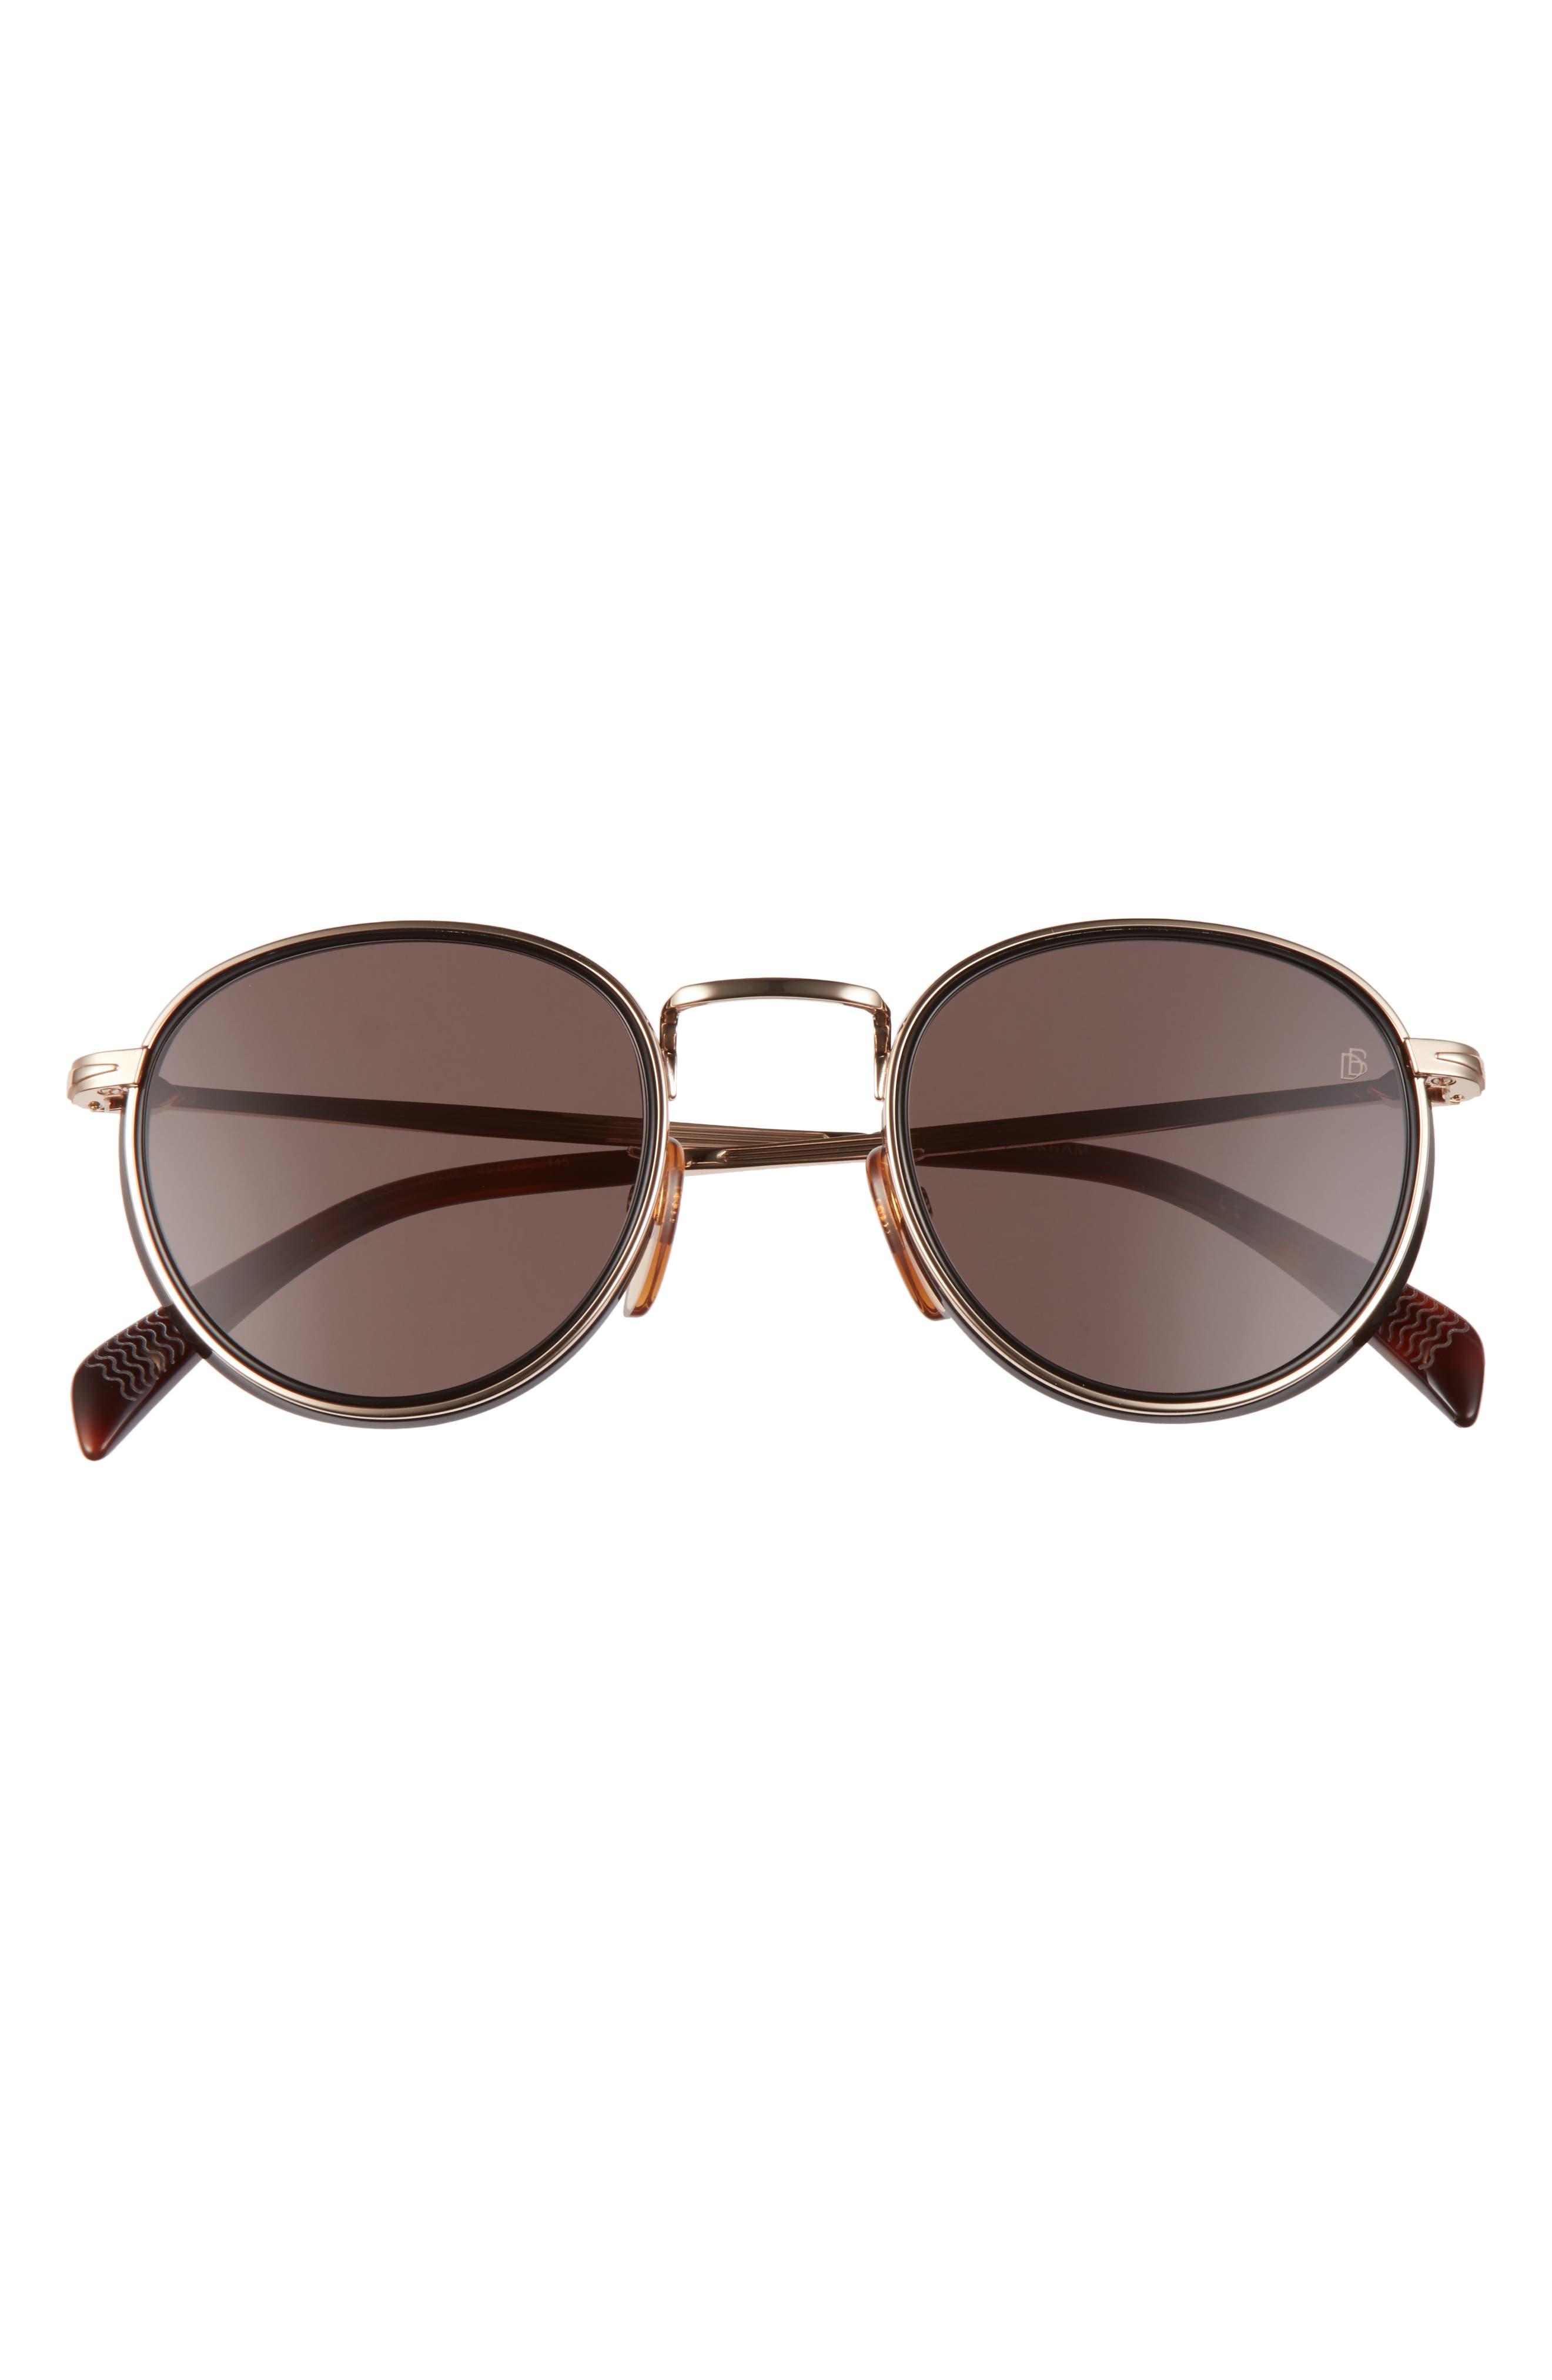 Men's Eyewear By David Beckham 49mm Round Sunglasses